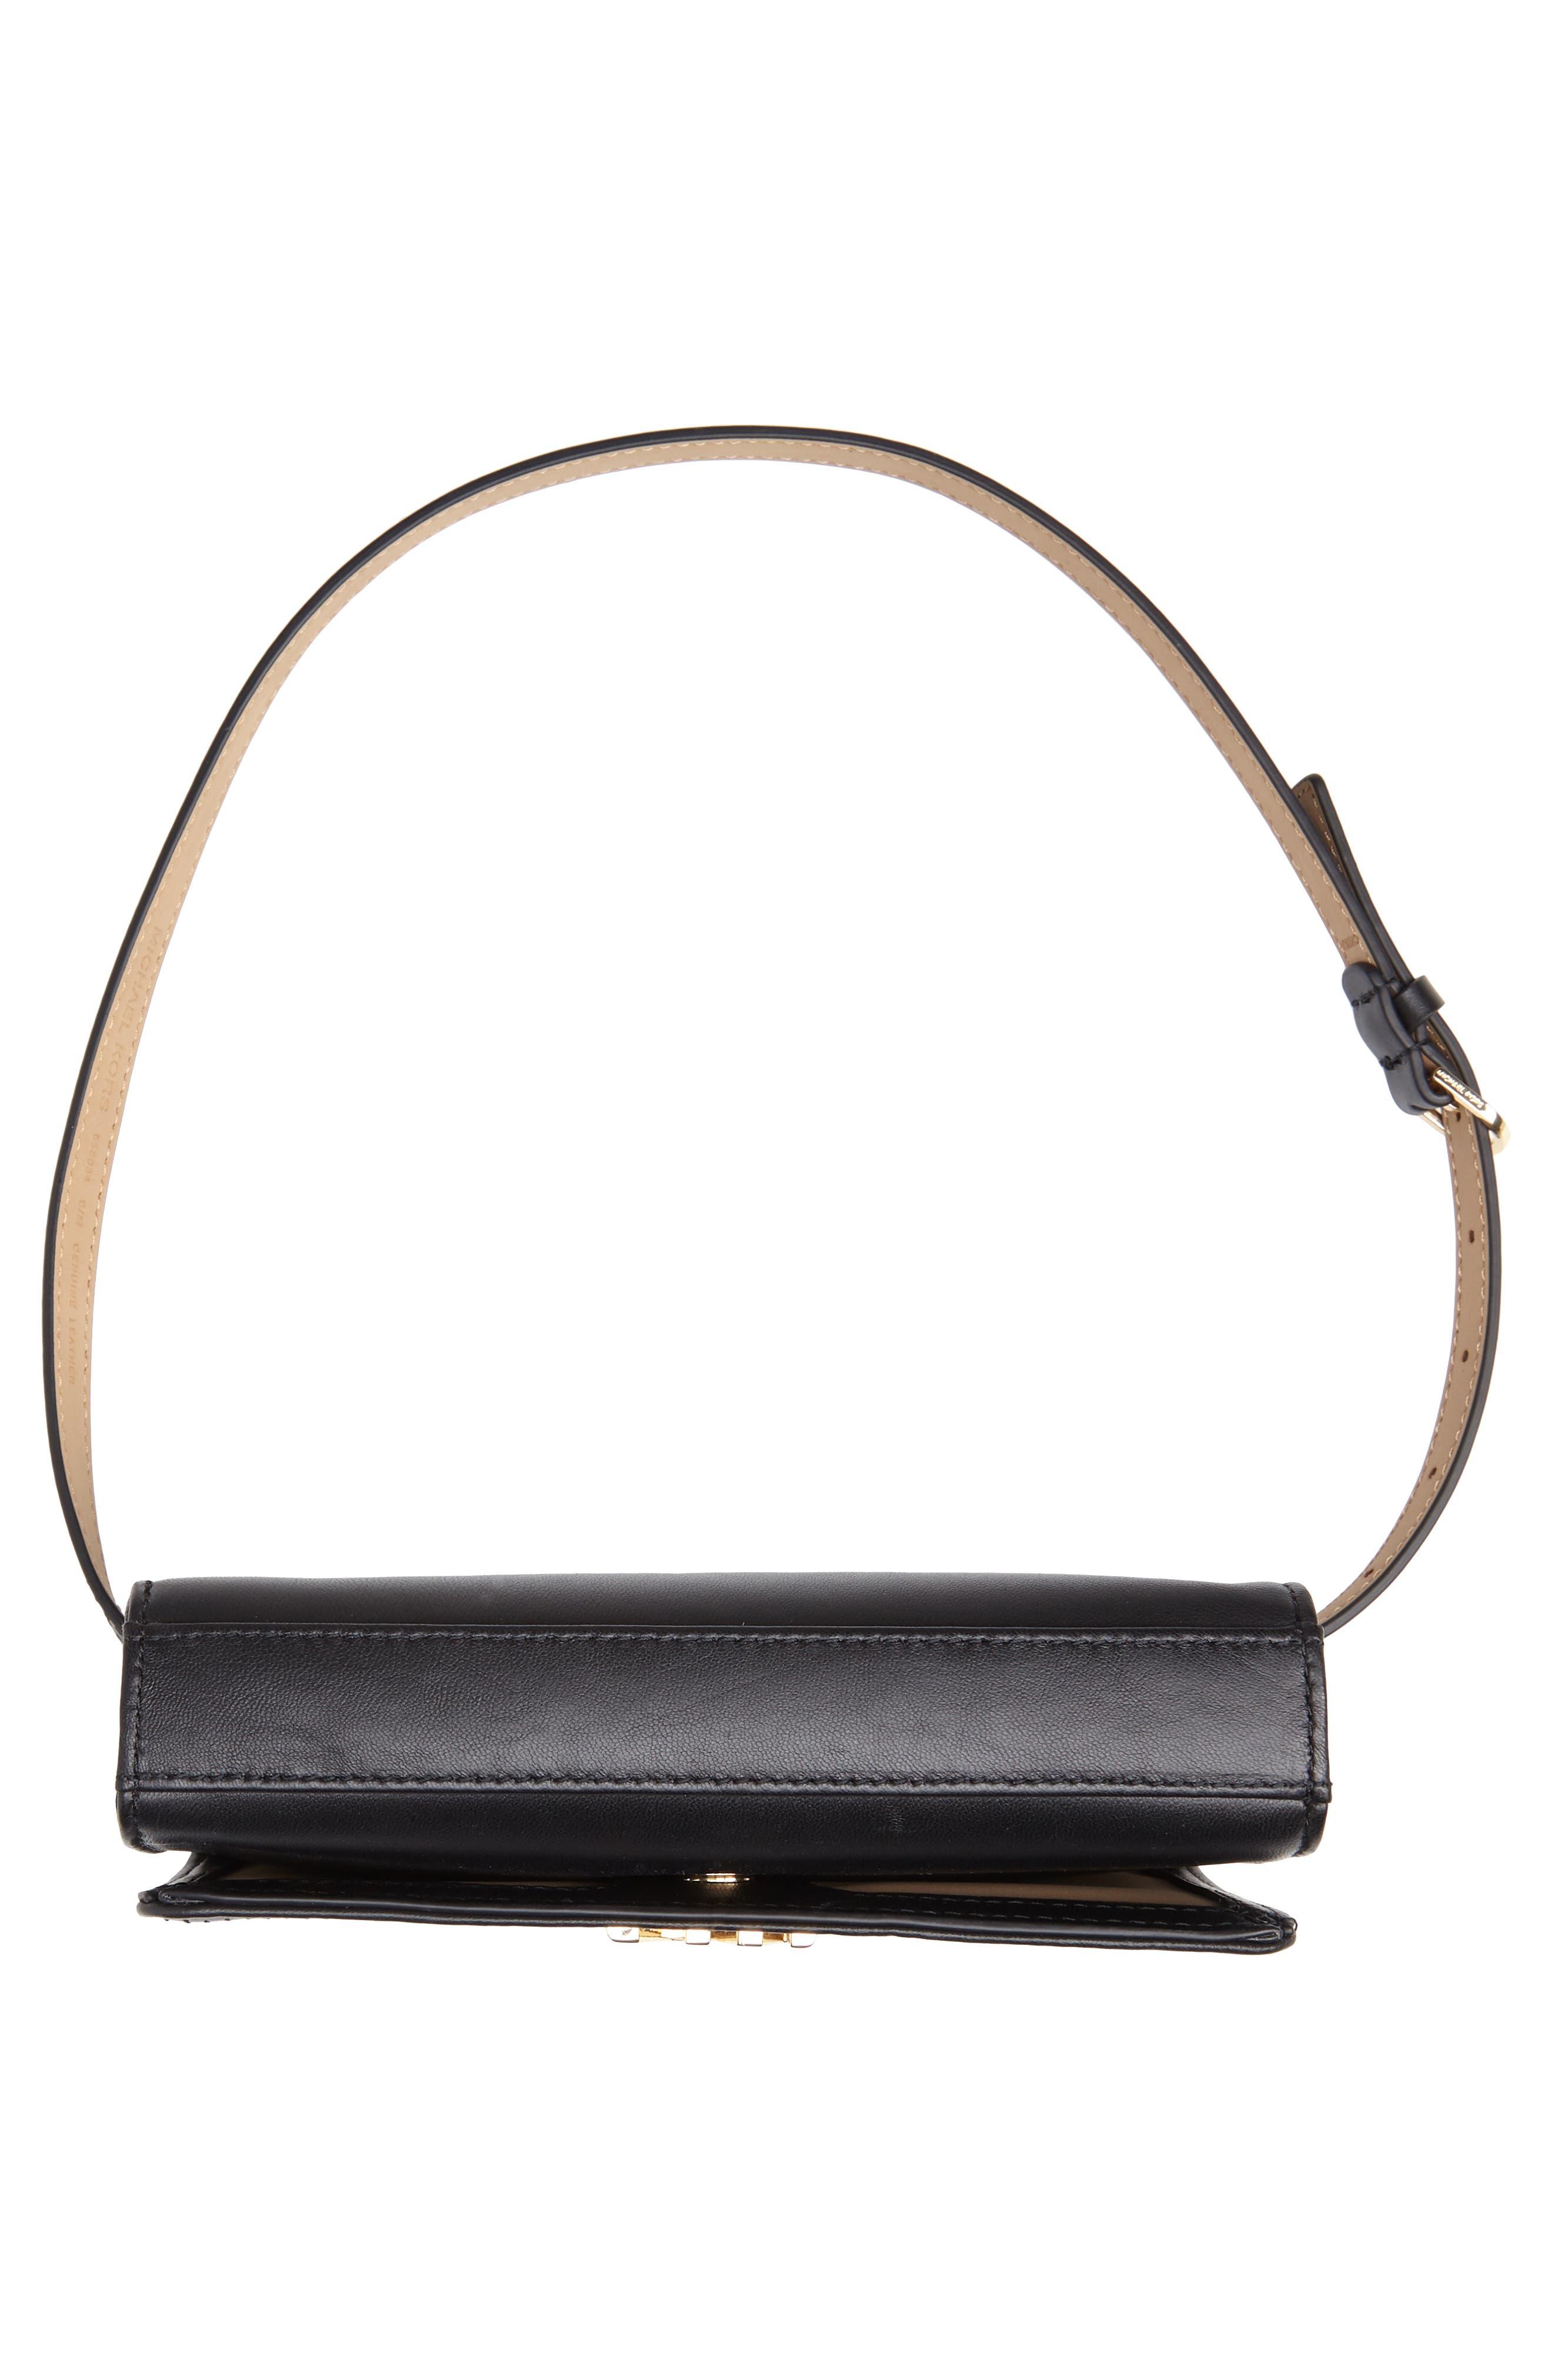 Deco M Quilted Leather Belt Bag,                             Alternate thumbnail 7, color,                             BLACK